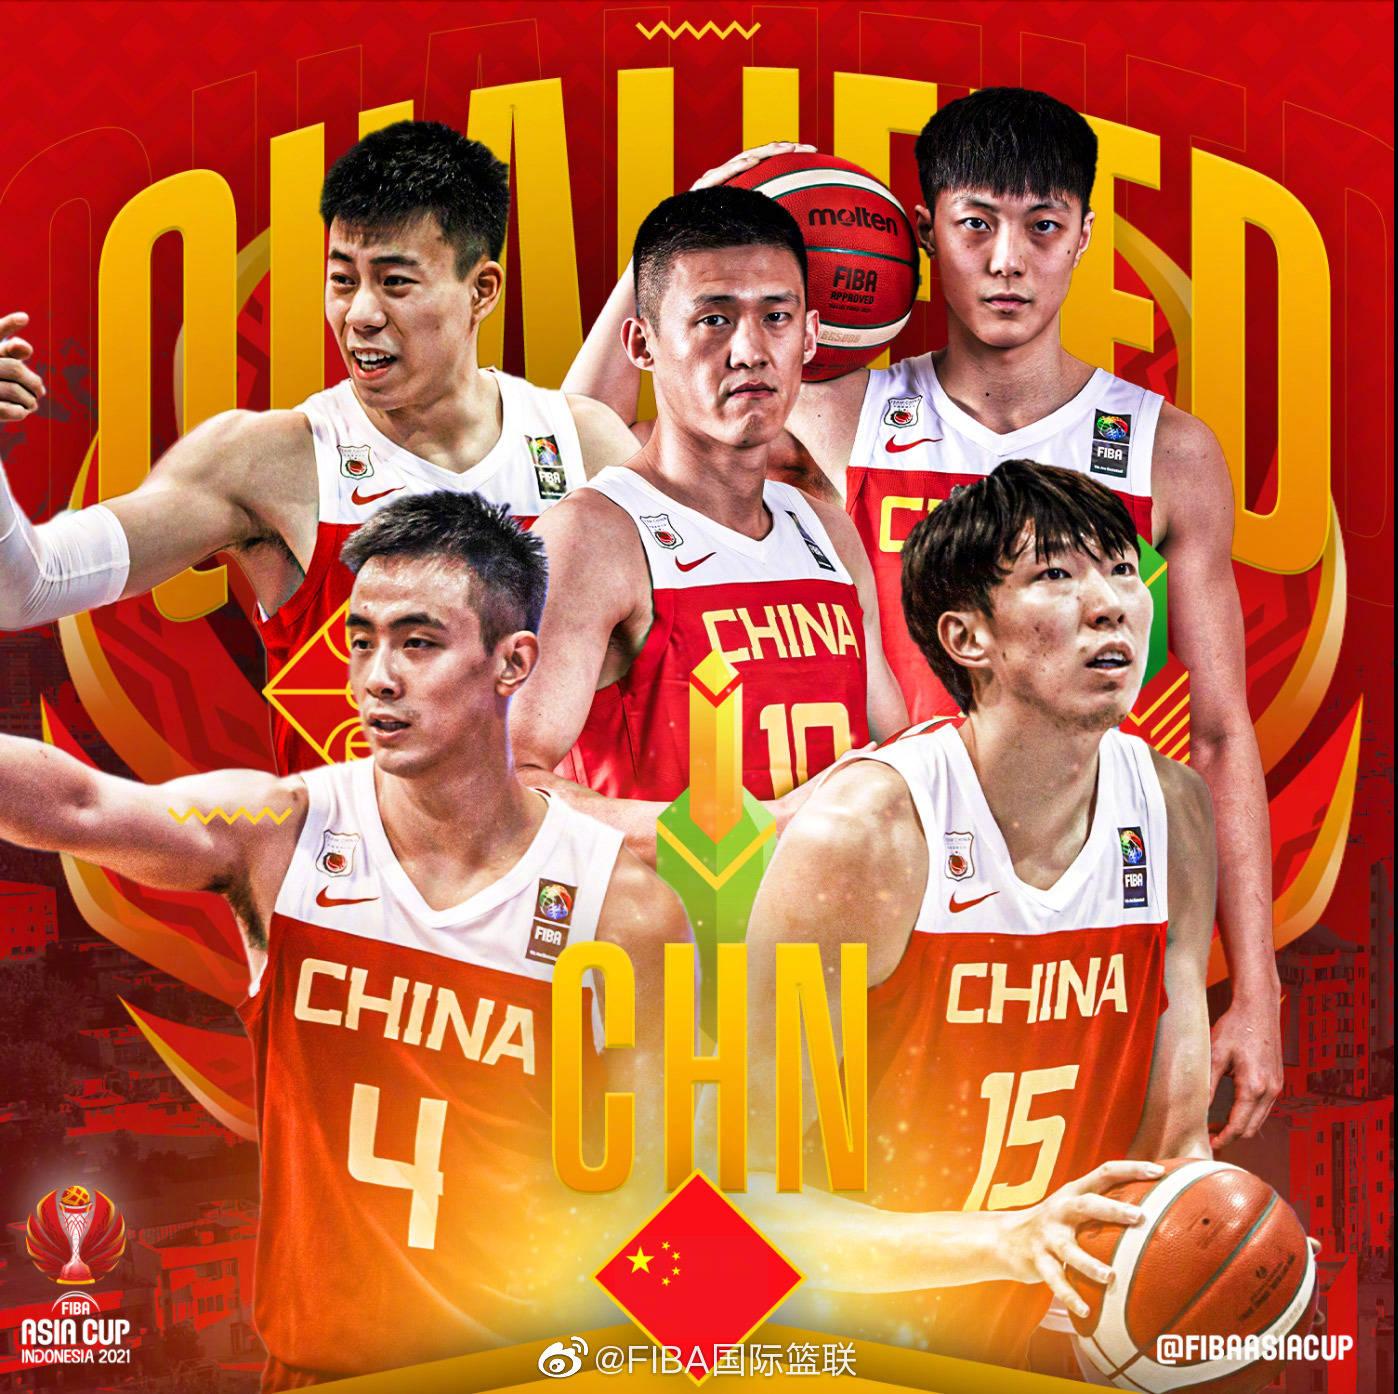 FIBA官微恭喜男篮晋级亚洲杯 8月17-29日印尼开战